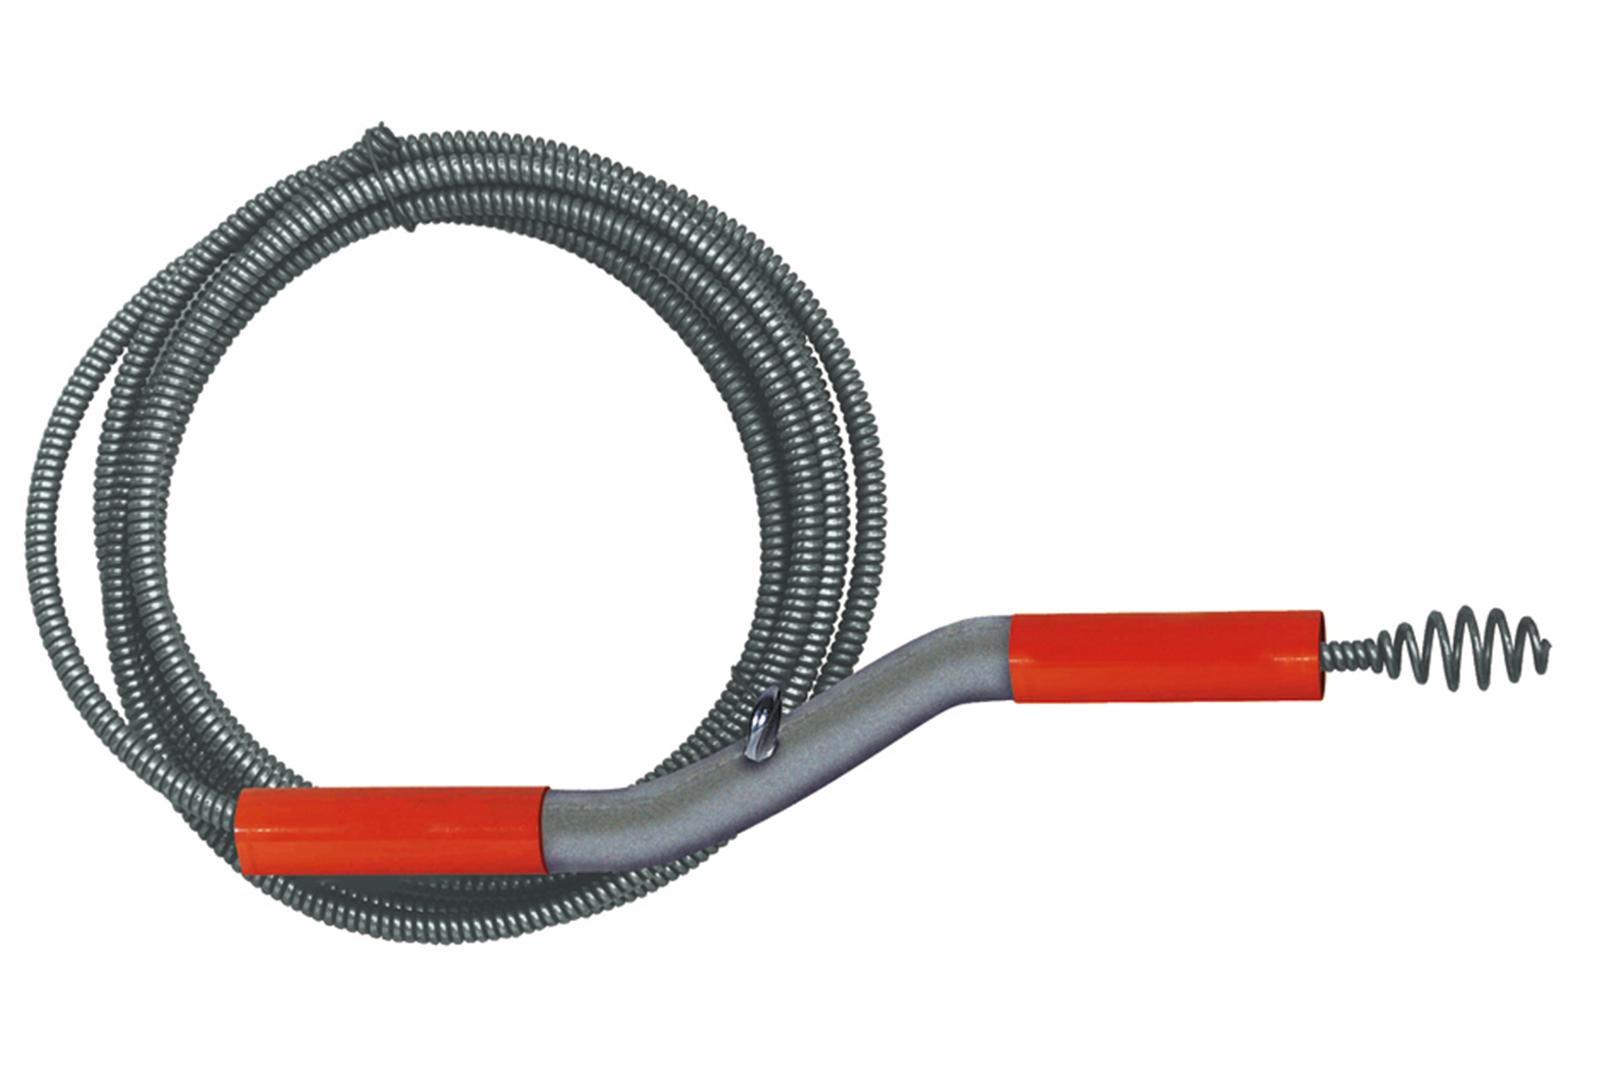 Трос для прочистки General pipe 15fl1-ddh